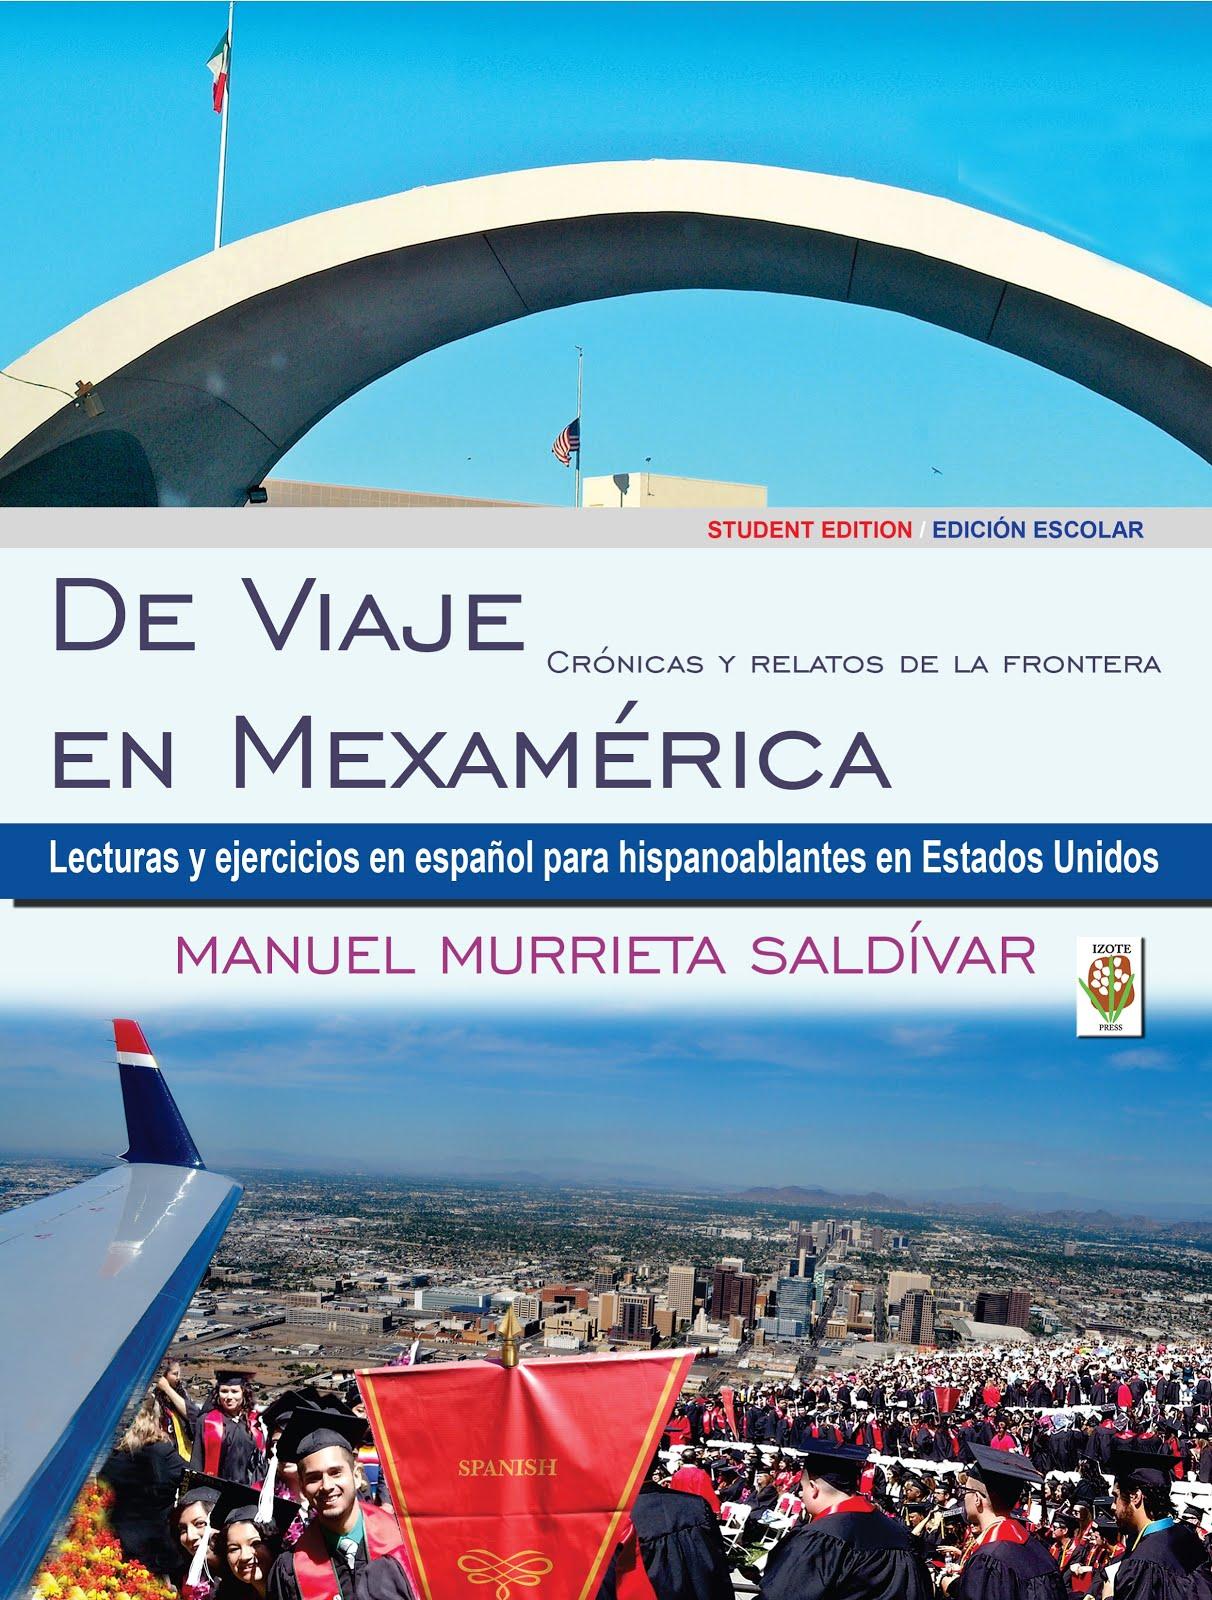 De viaje en Mexamérica